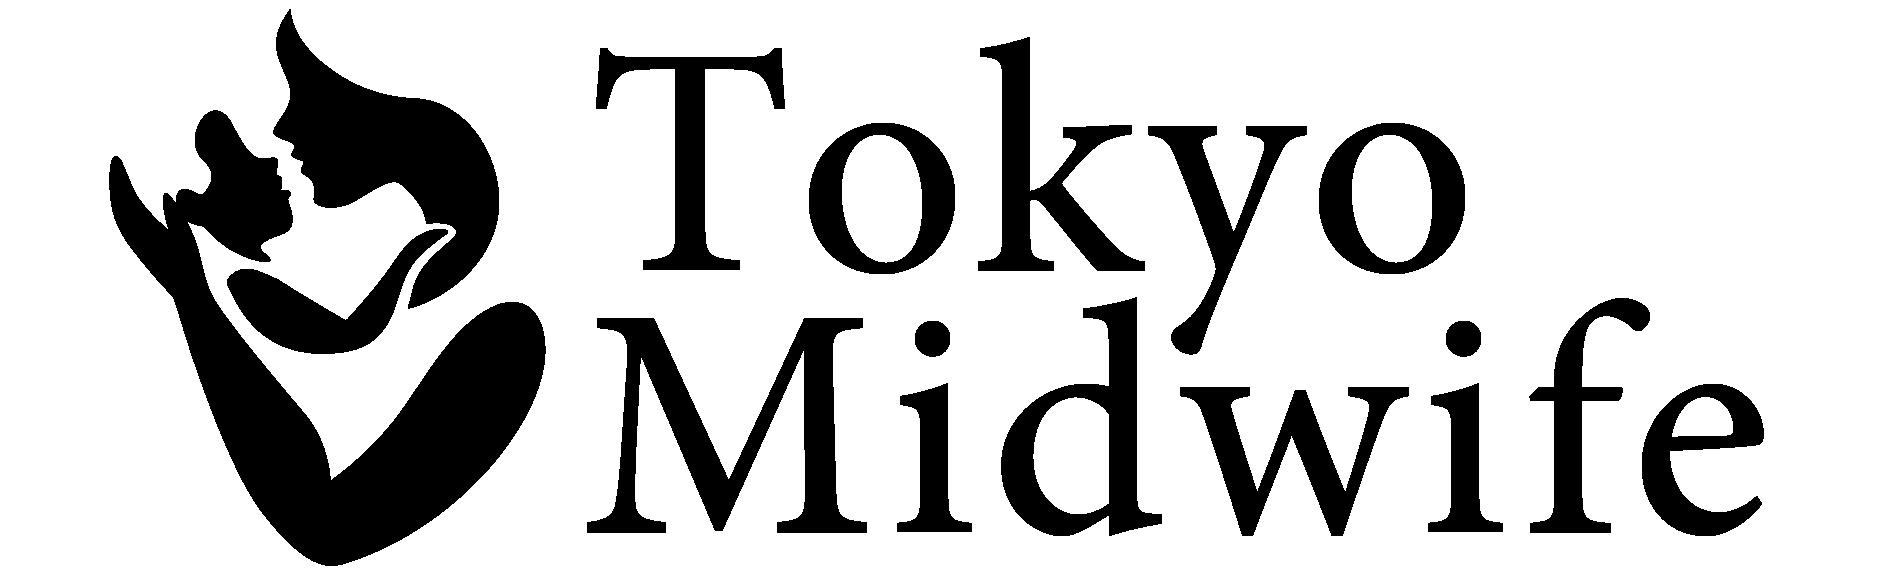 Tokyo Midwife Logo